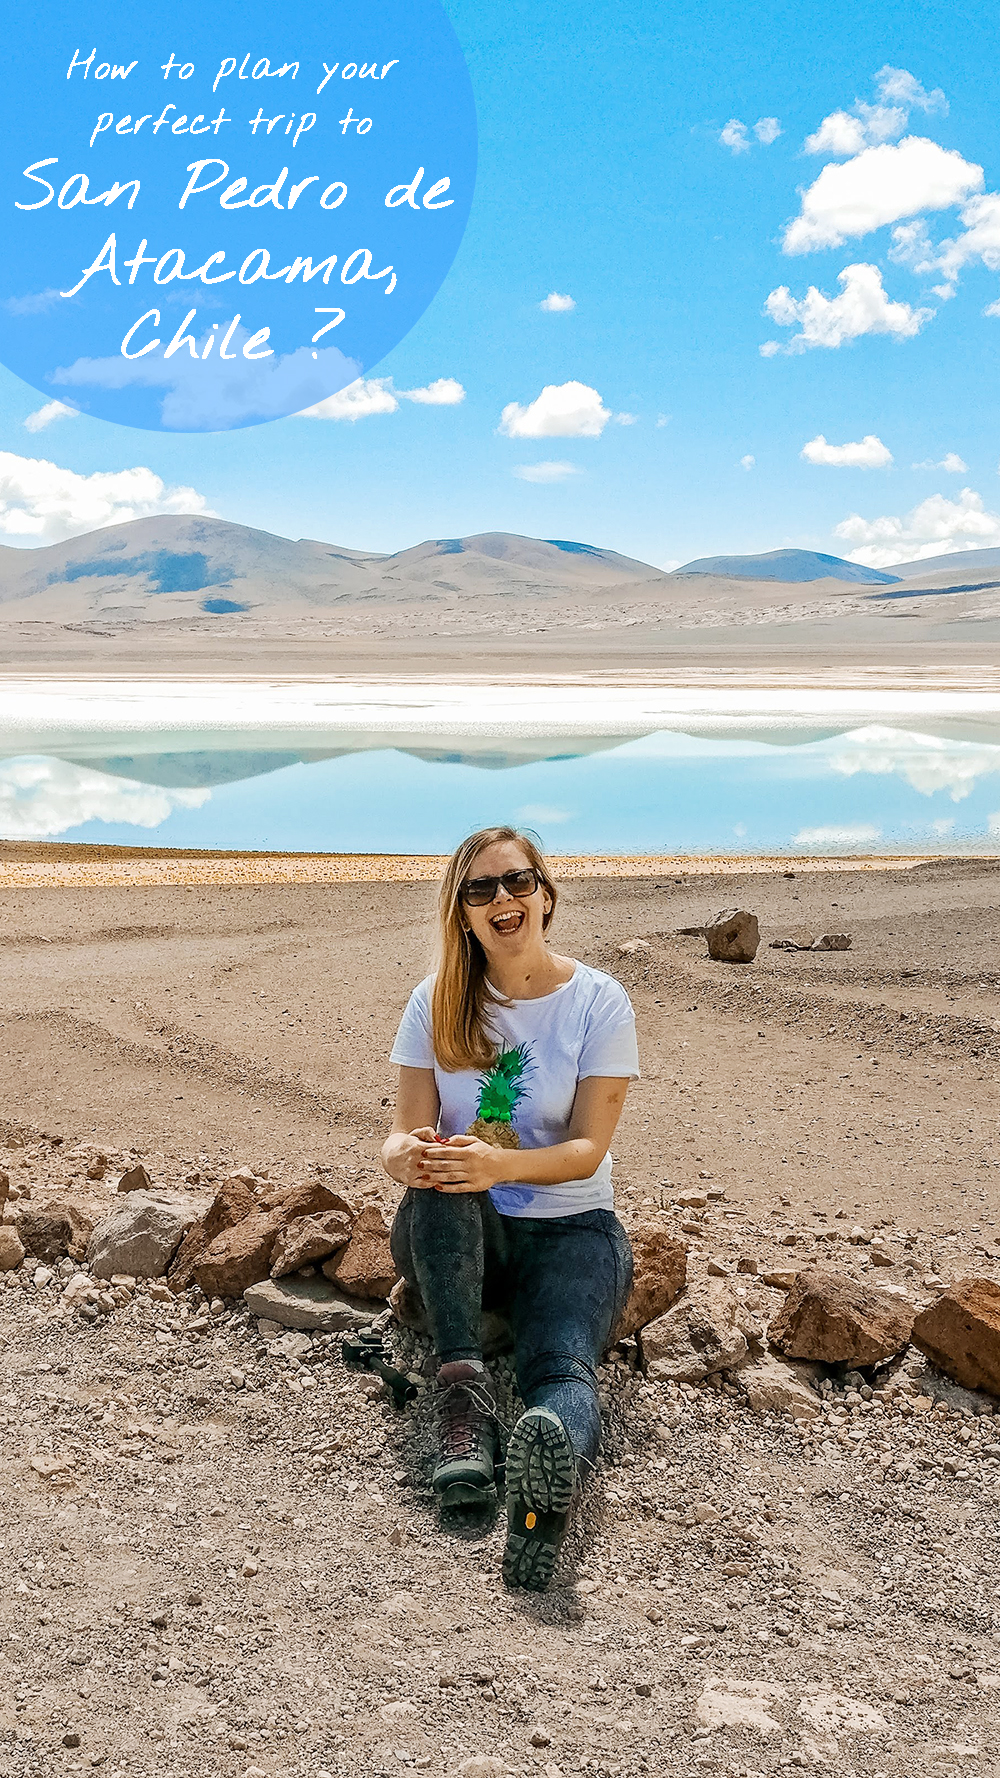 How to plan your perfect trip to San Pedro de Atacama, Chile? | Aliz's Wonderland